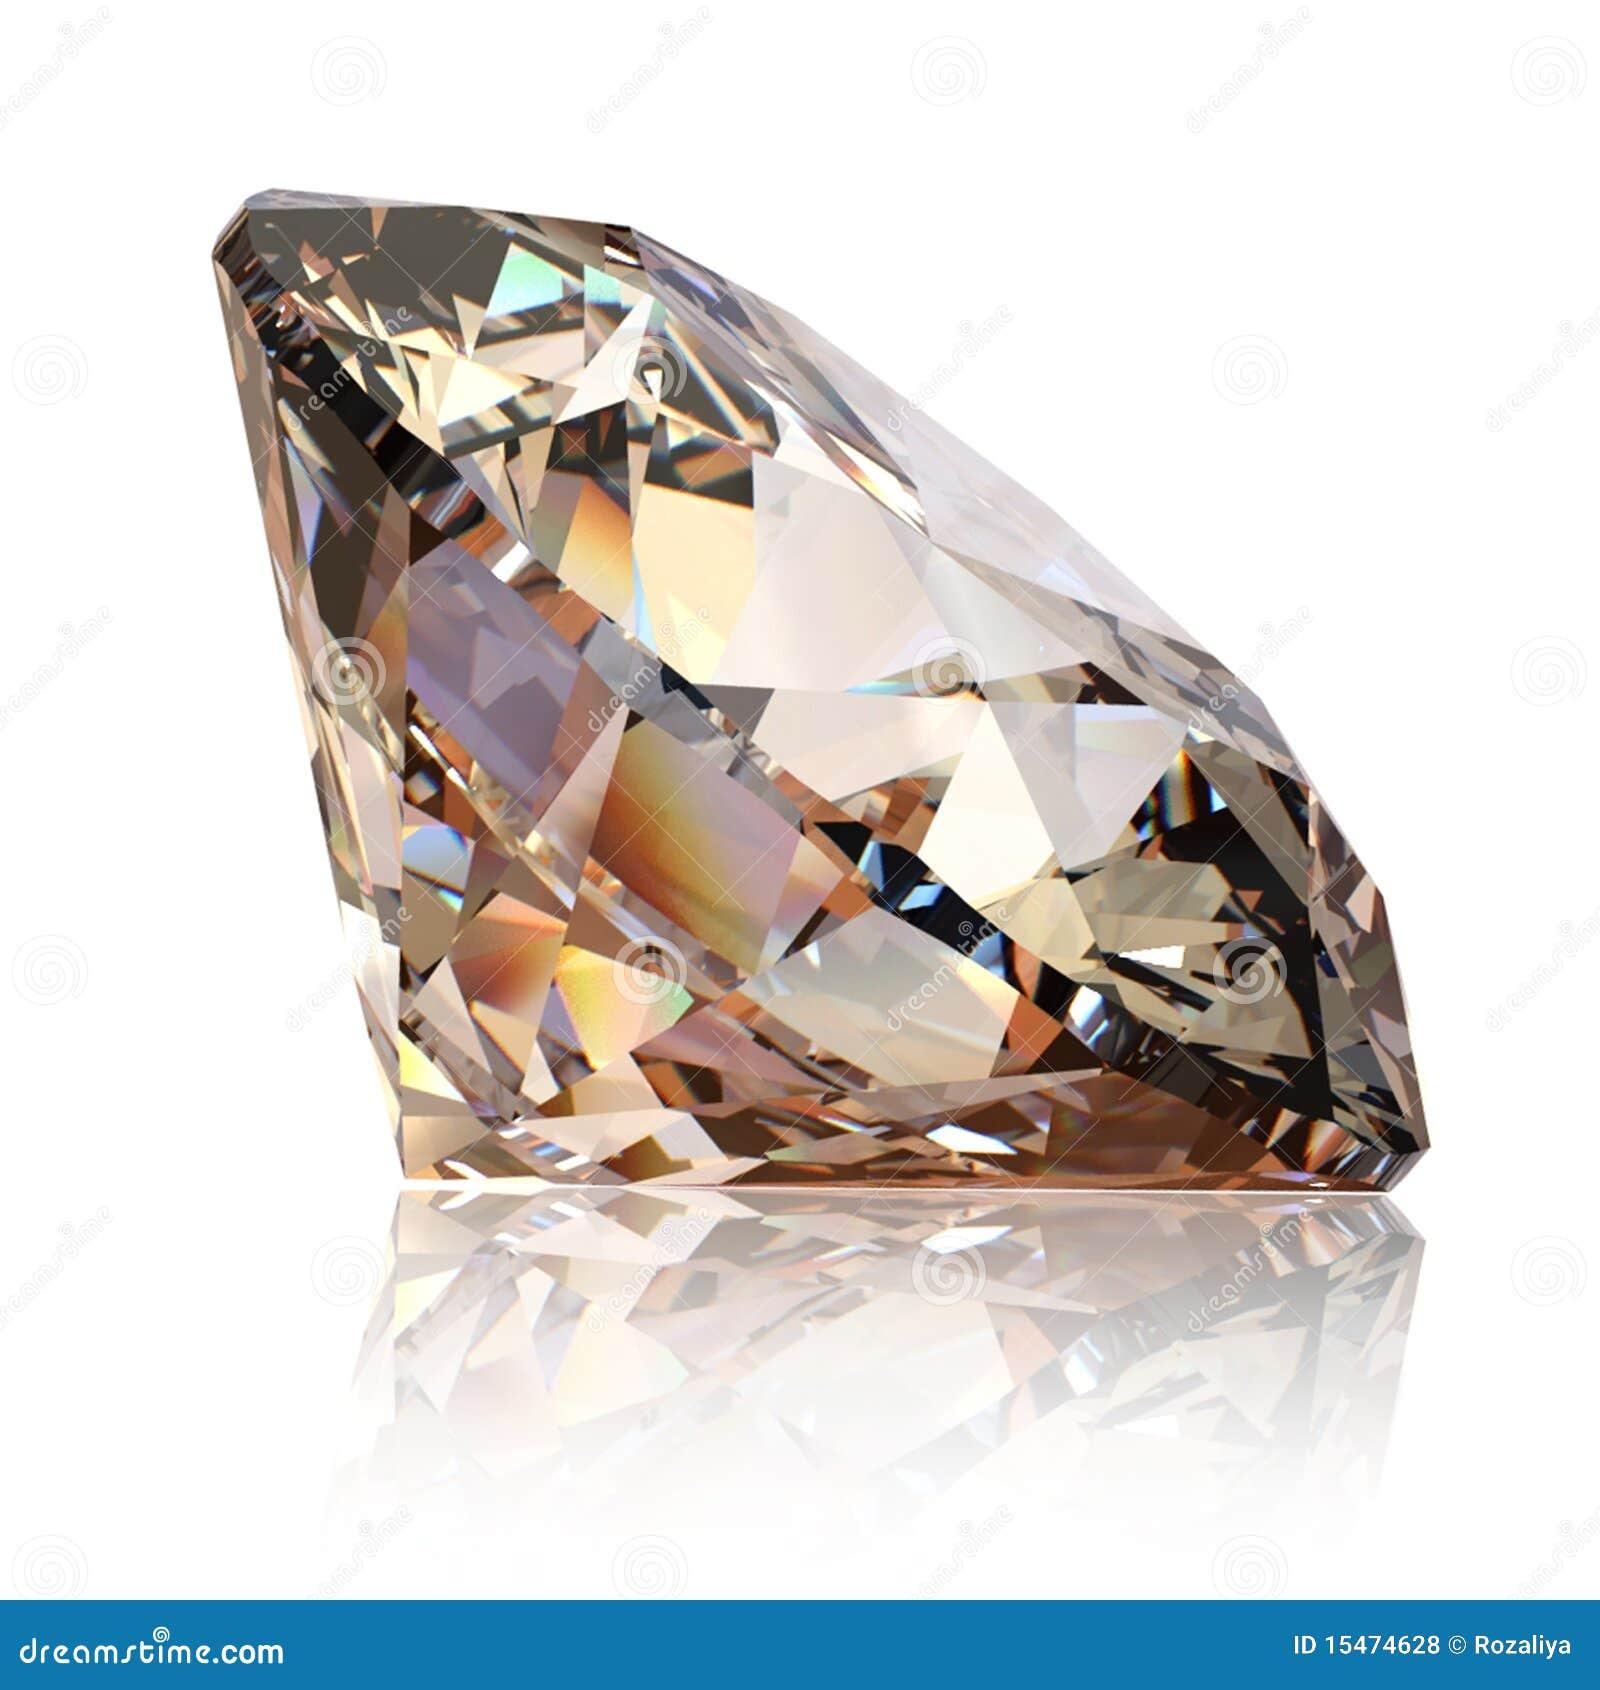 Cognac Diamond Royalty Free Stock Photos  Image 15474628. Acrylic Engagement Rings. $10000 Wedding Rings. Men Engagement Rings. Utility Wedding Rings. Mathematical Rings. Gorgeous Rings. Flat Circle Wedding Rings. Modernist Wedding Rings